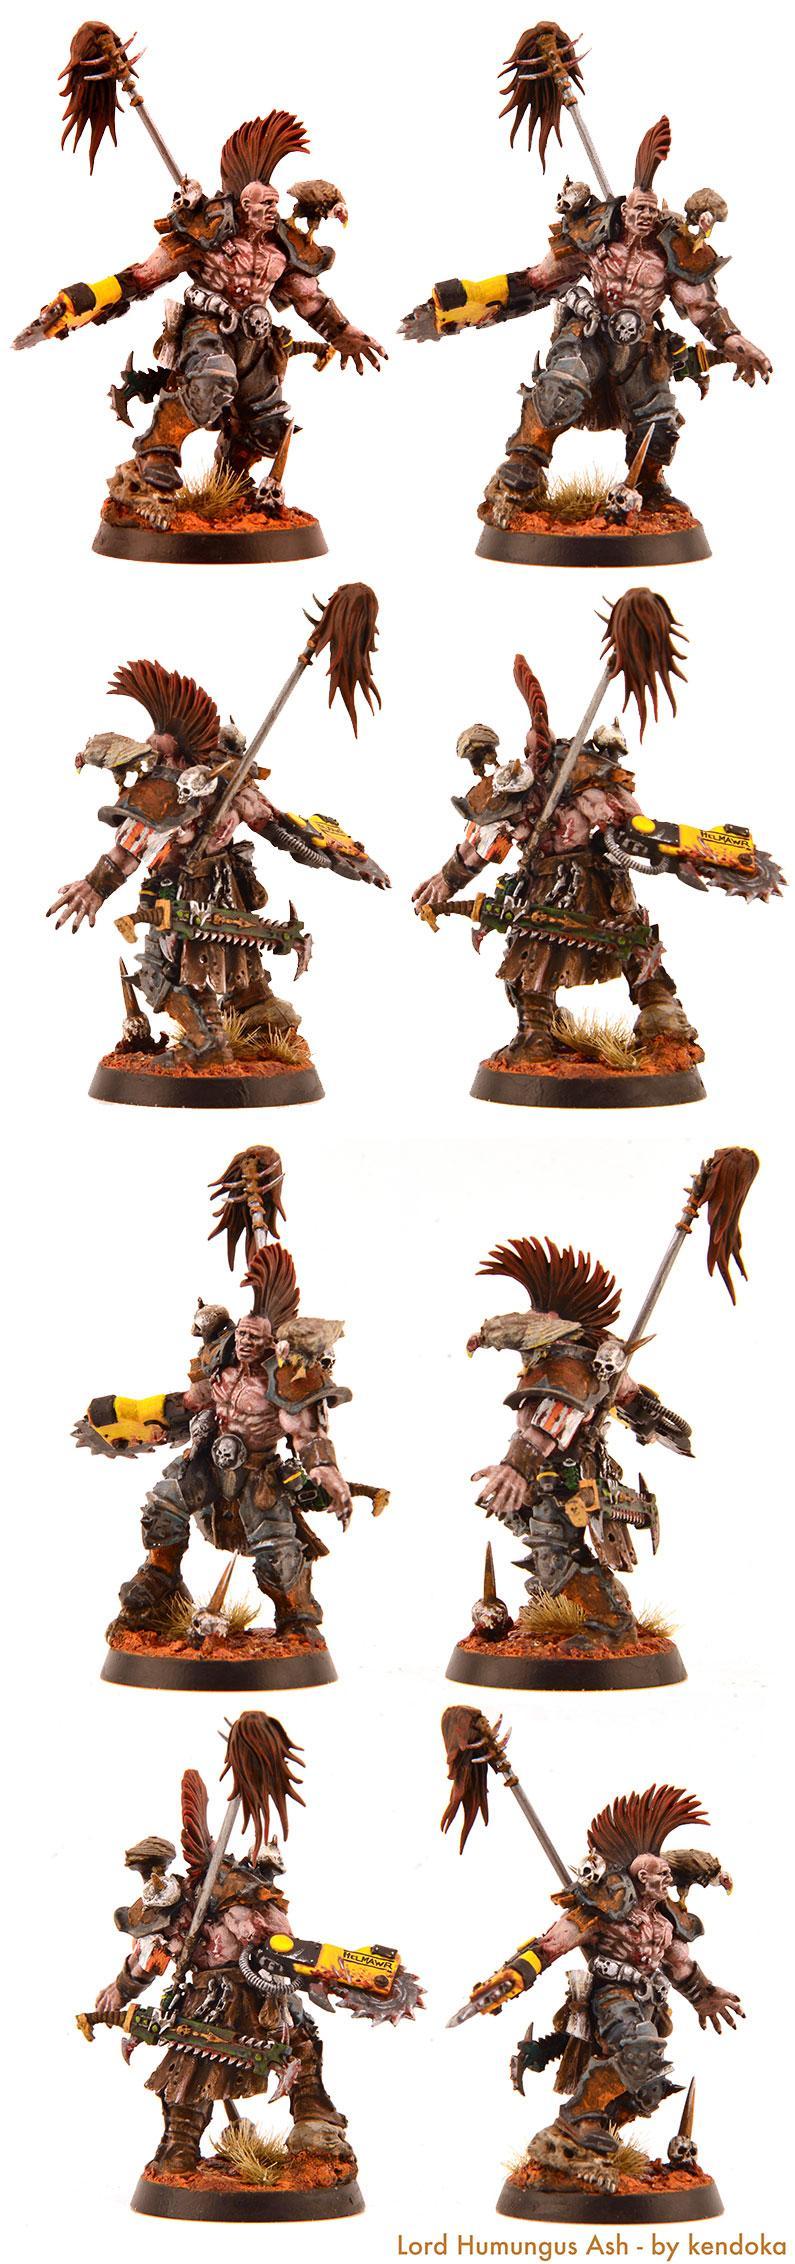 Armageddon Shadow War, Lord Humungus Ash, Mad Max, Necromunda